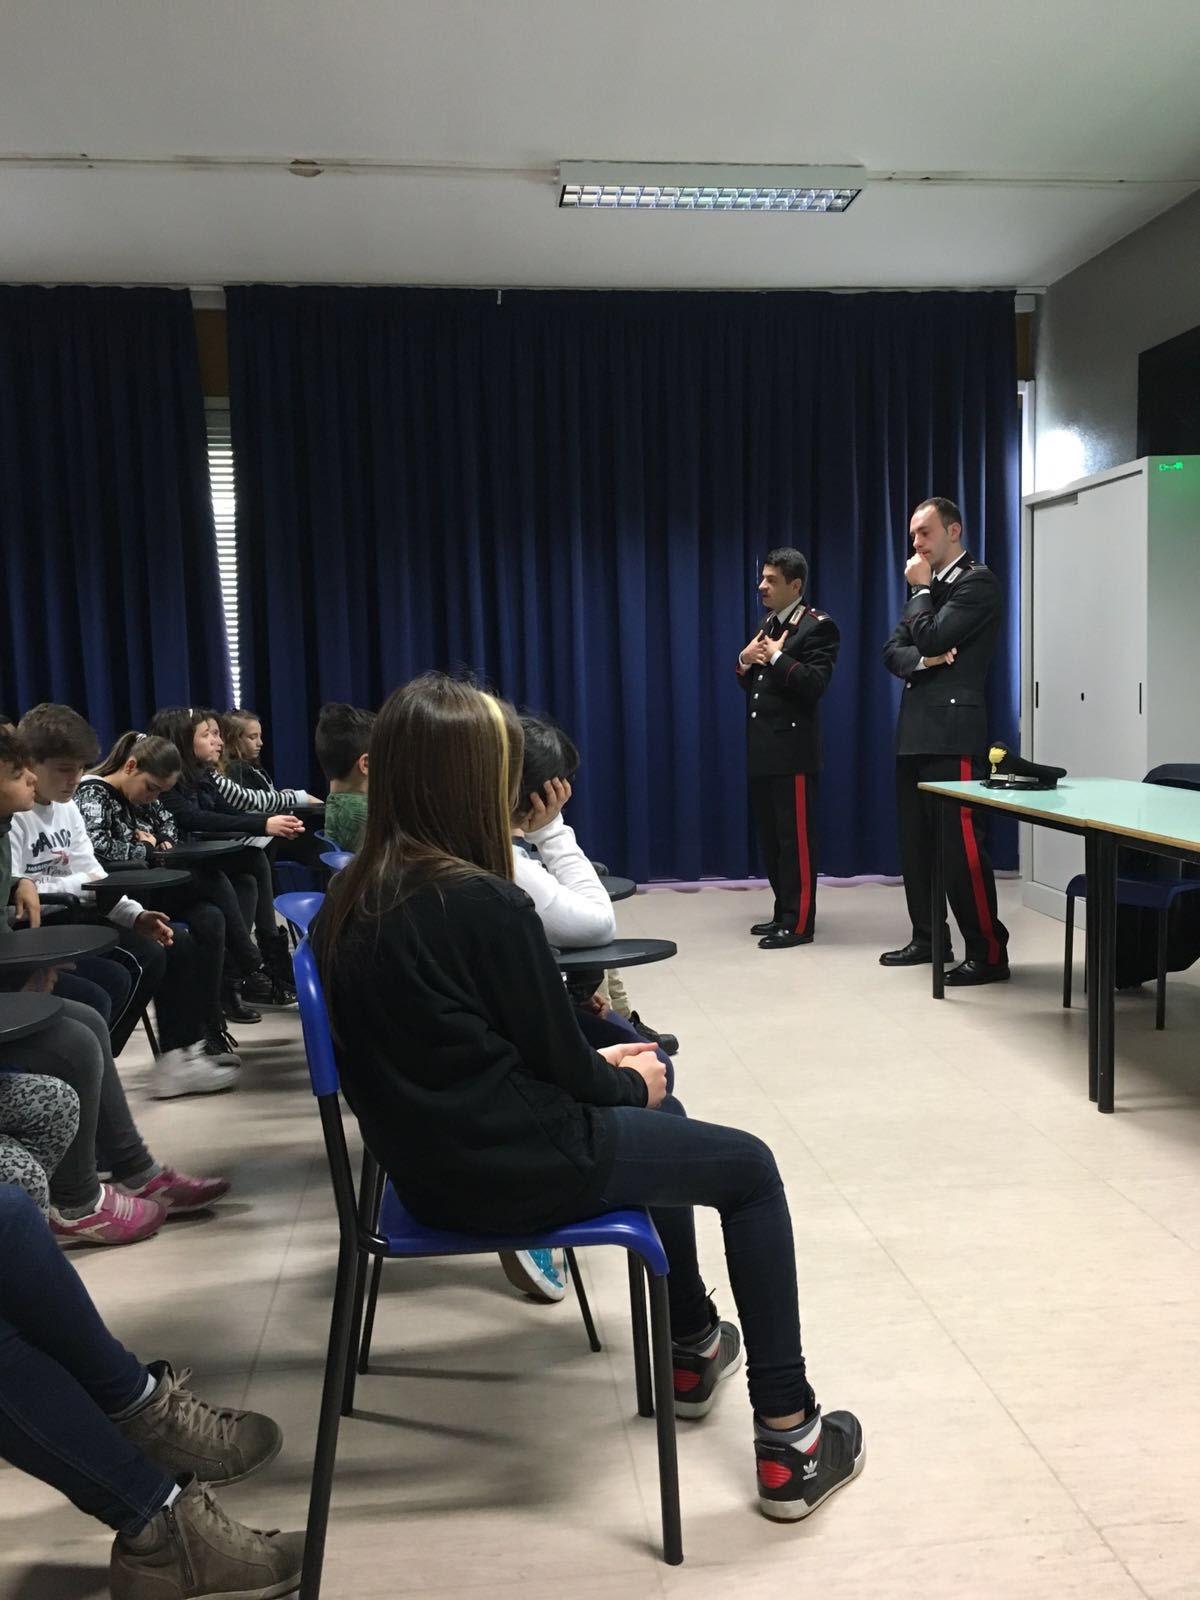 Incontro con i carabinieri